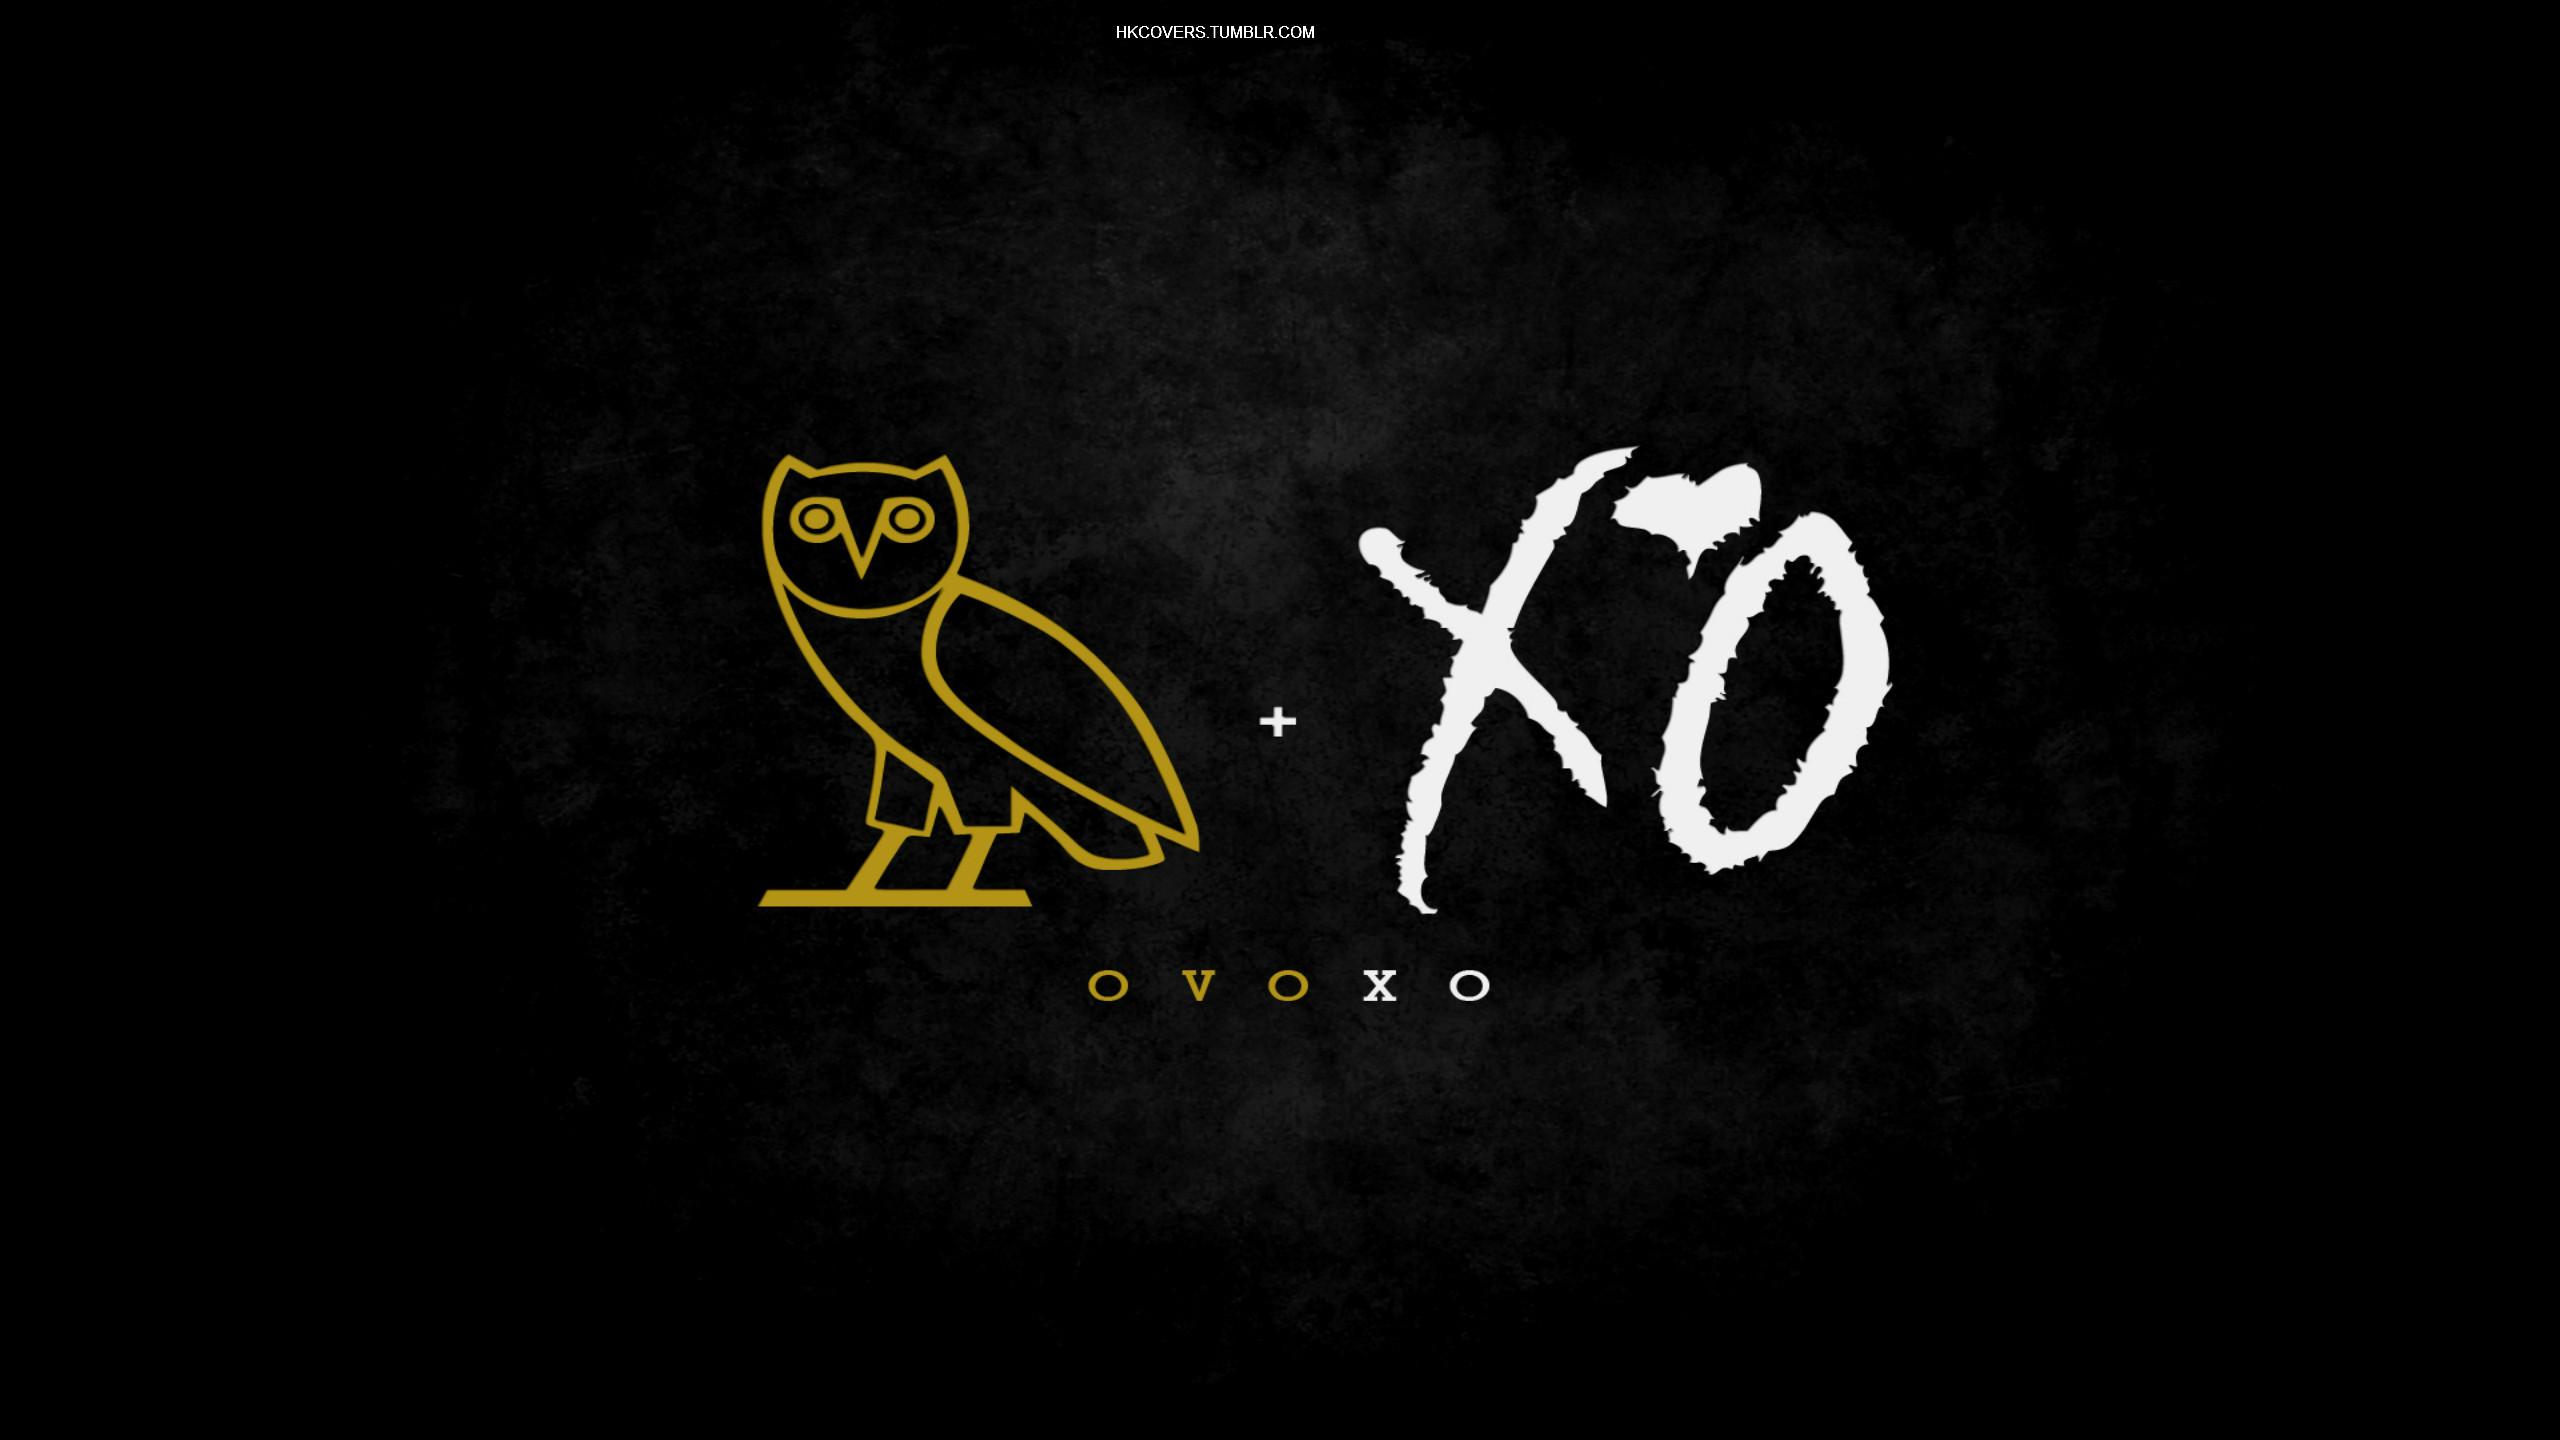 <b>OVOXO Wallpaper</b> HD – WallpaperSafari